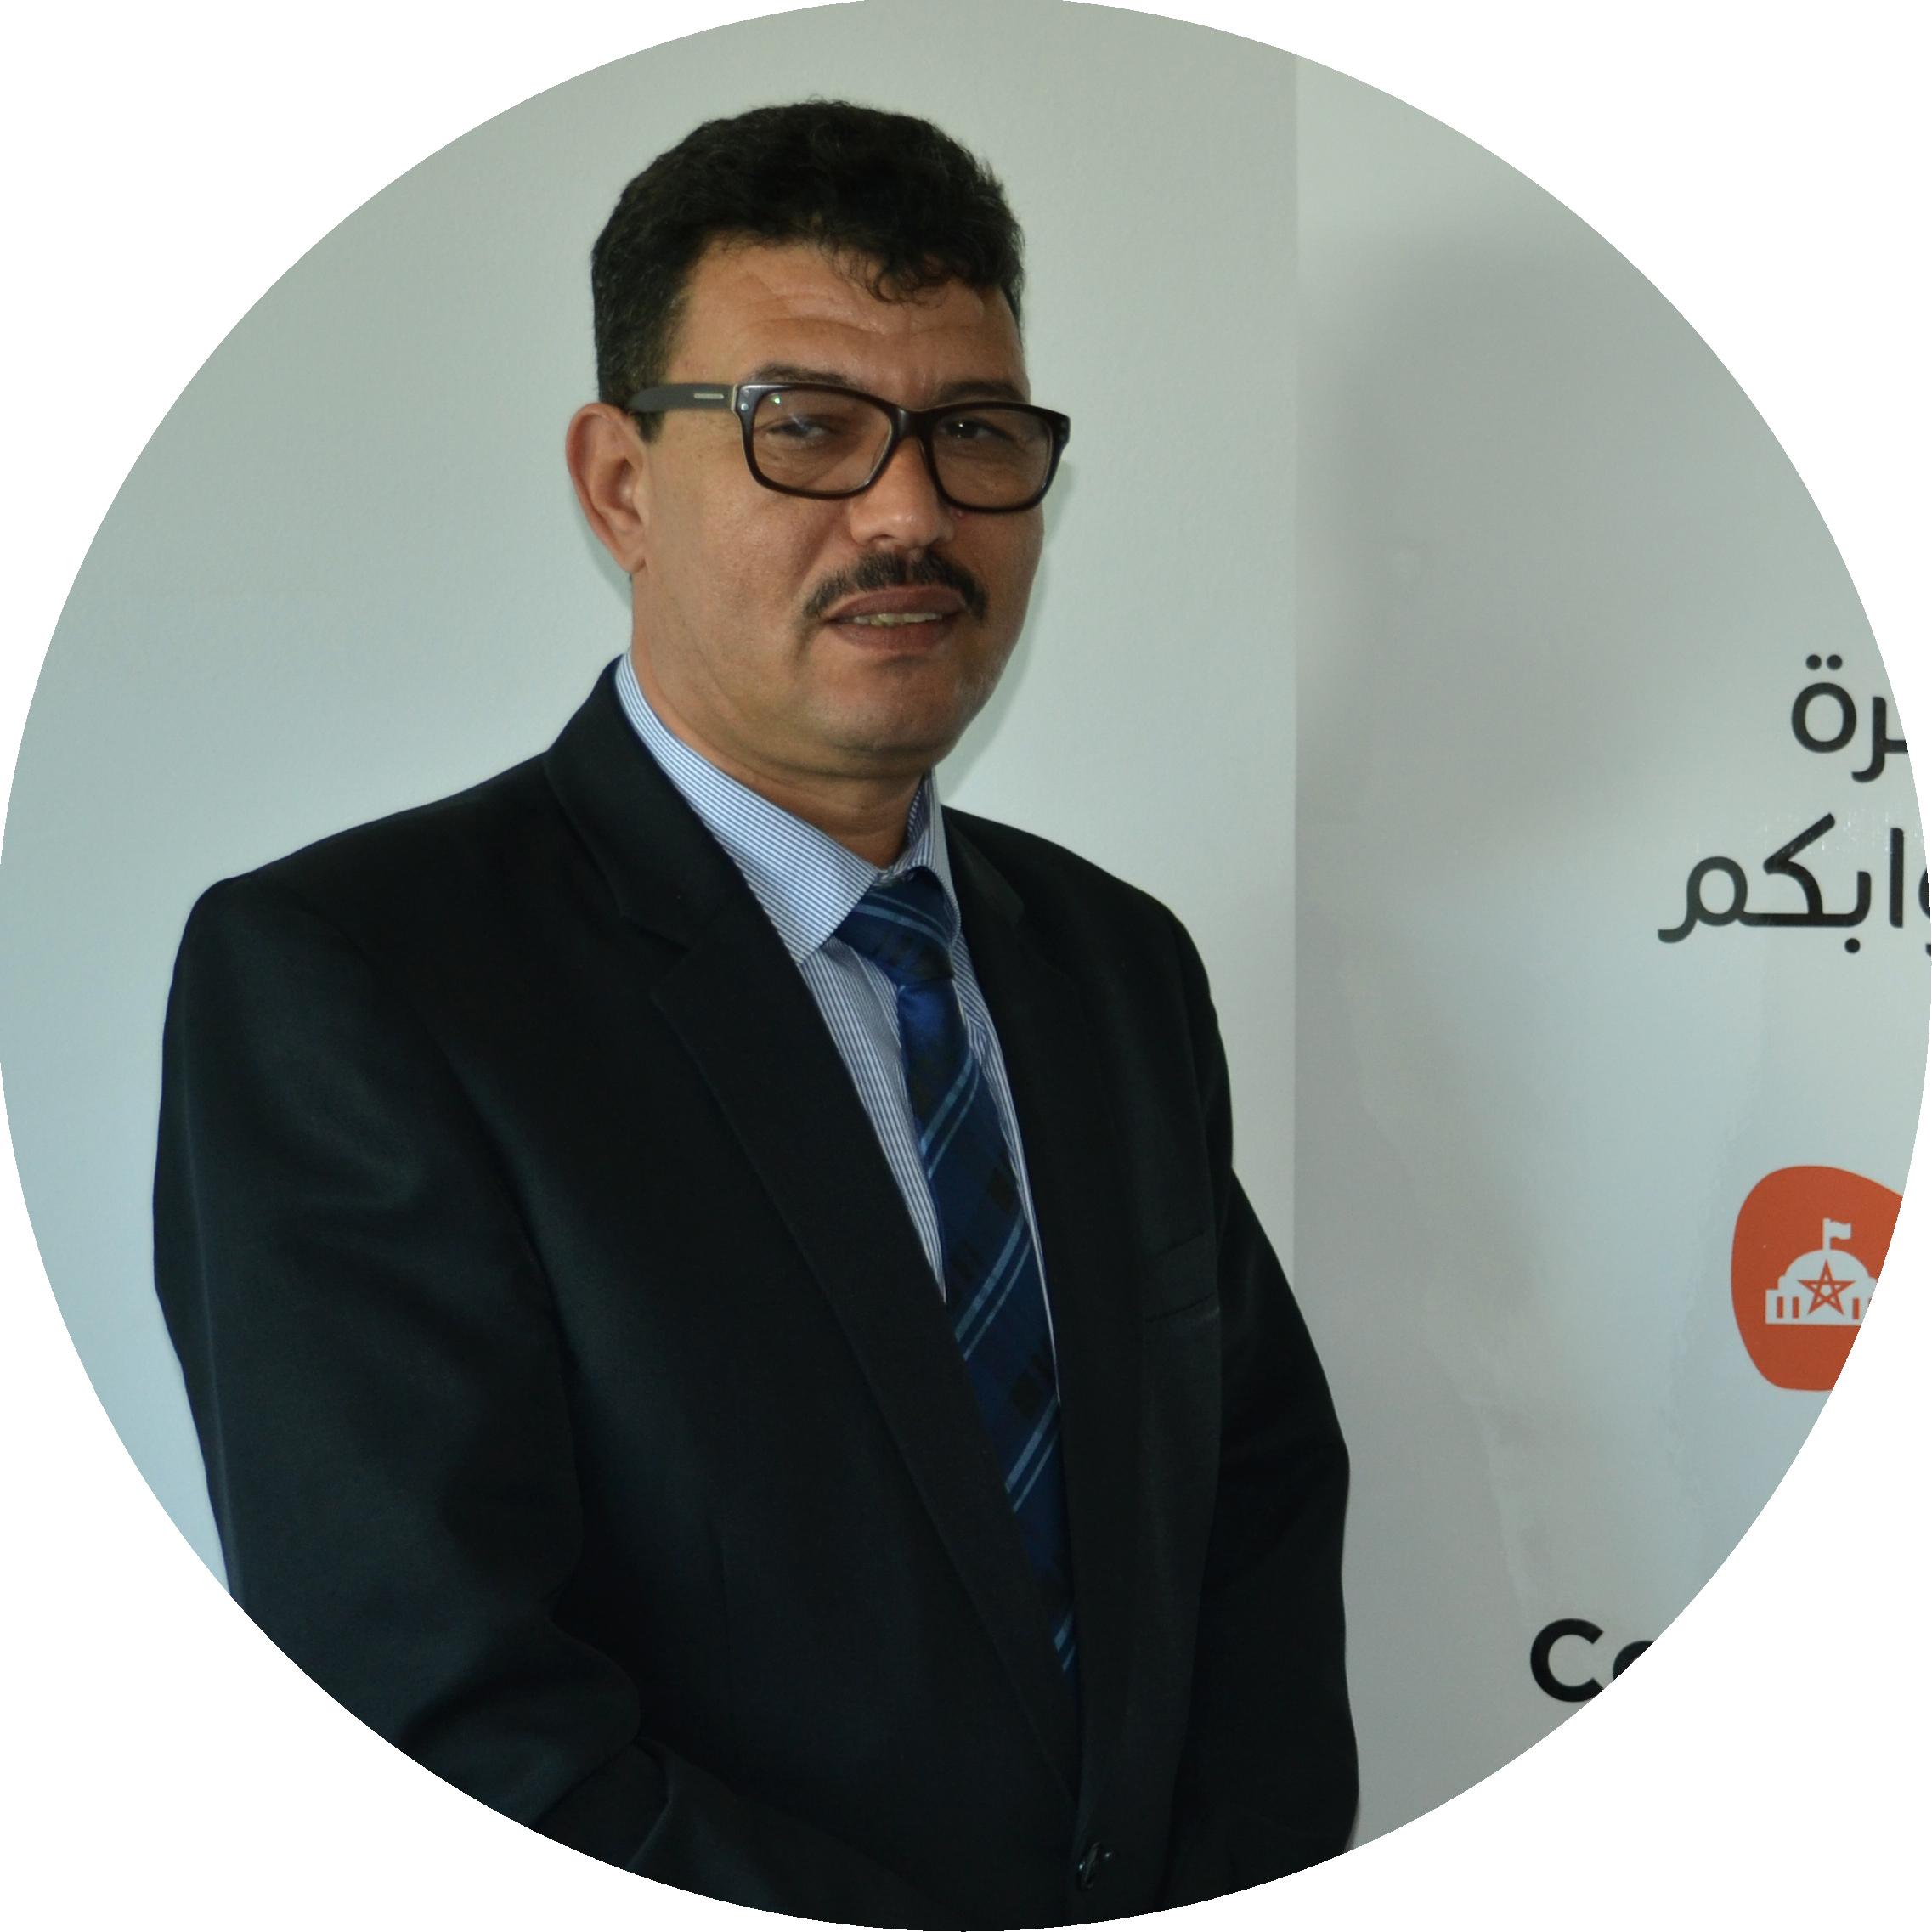 Elhoucine Azougagh